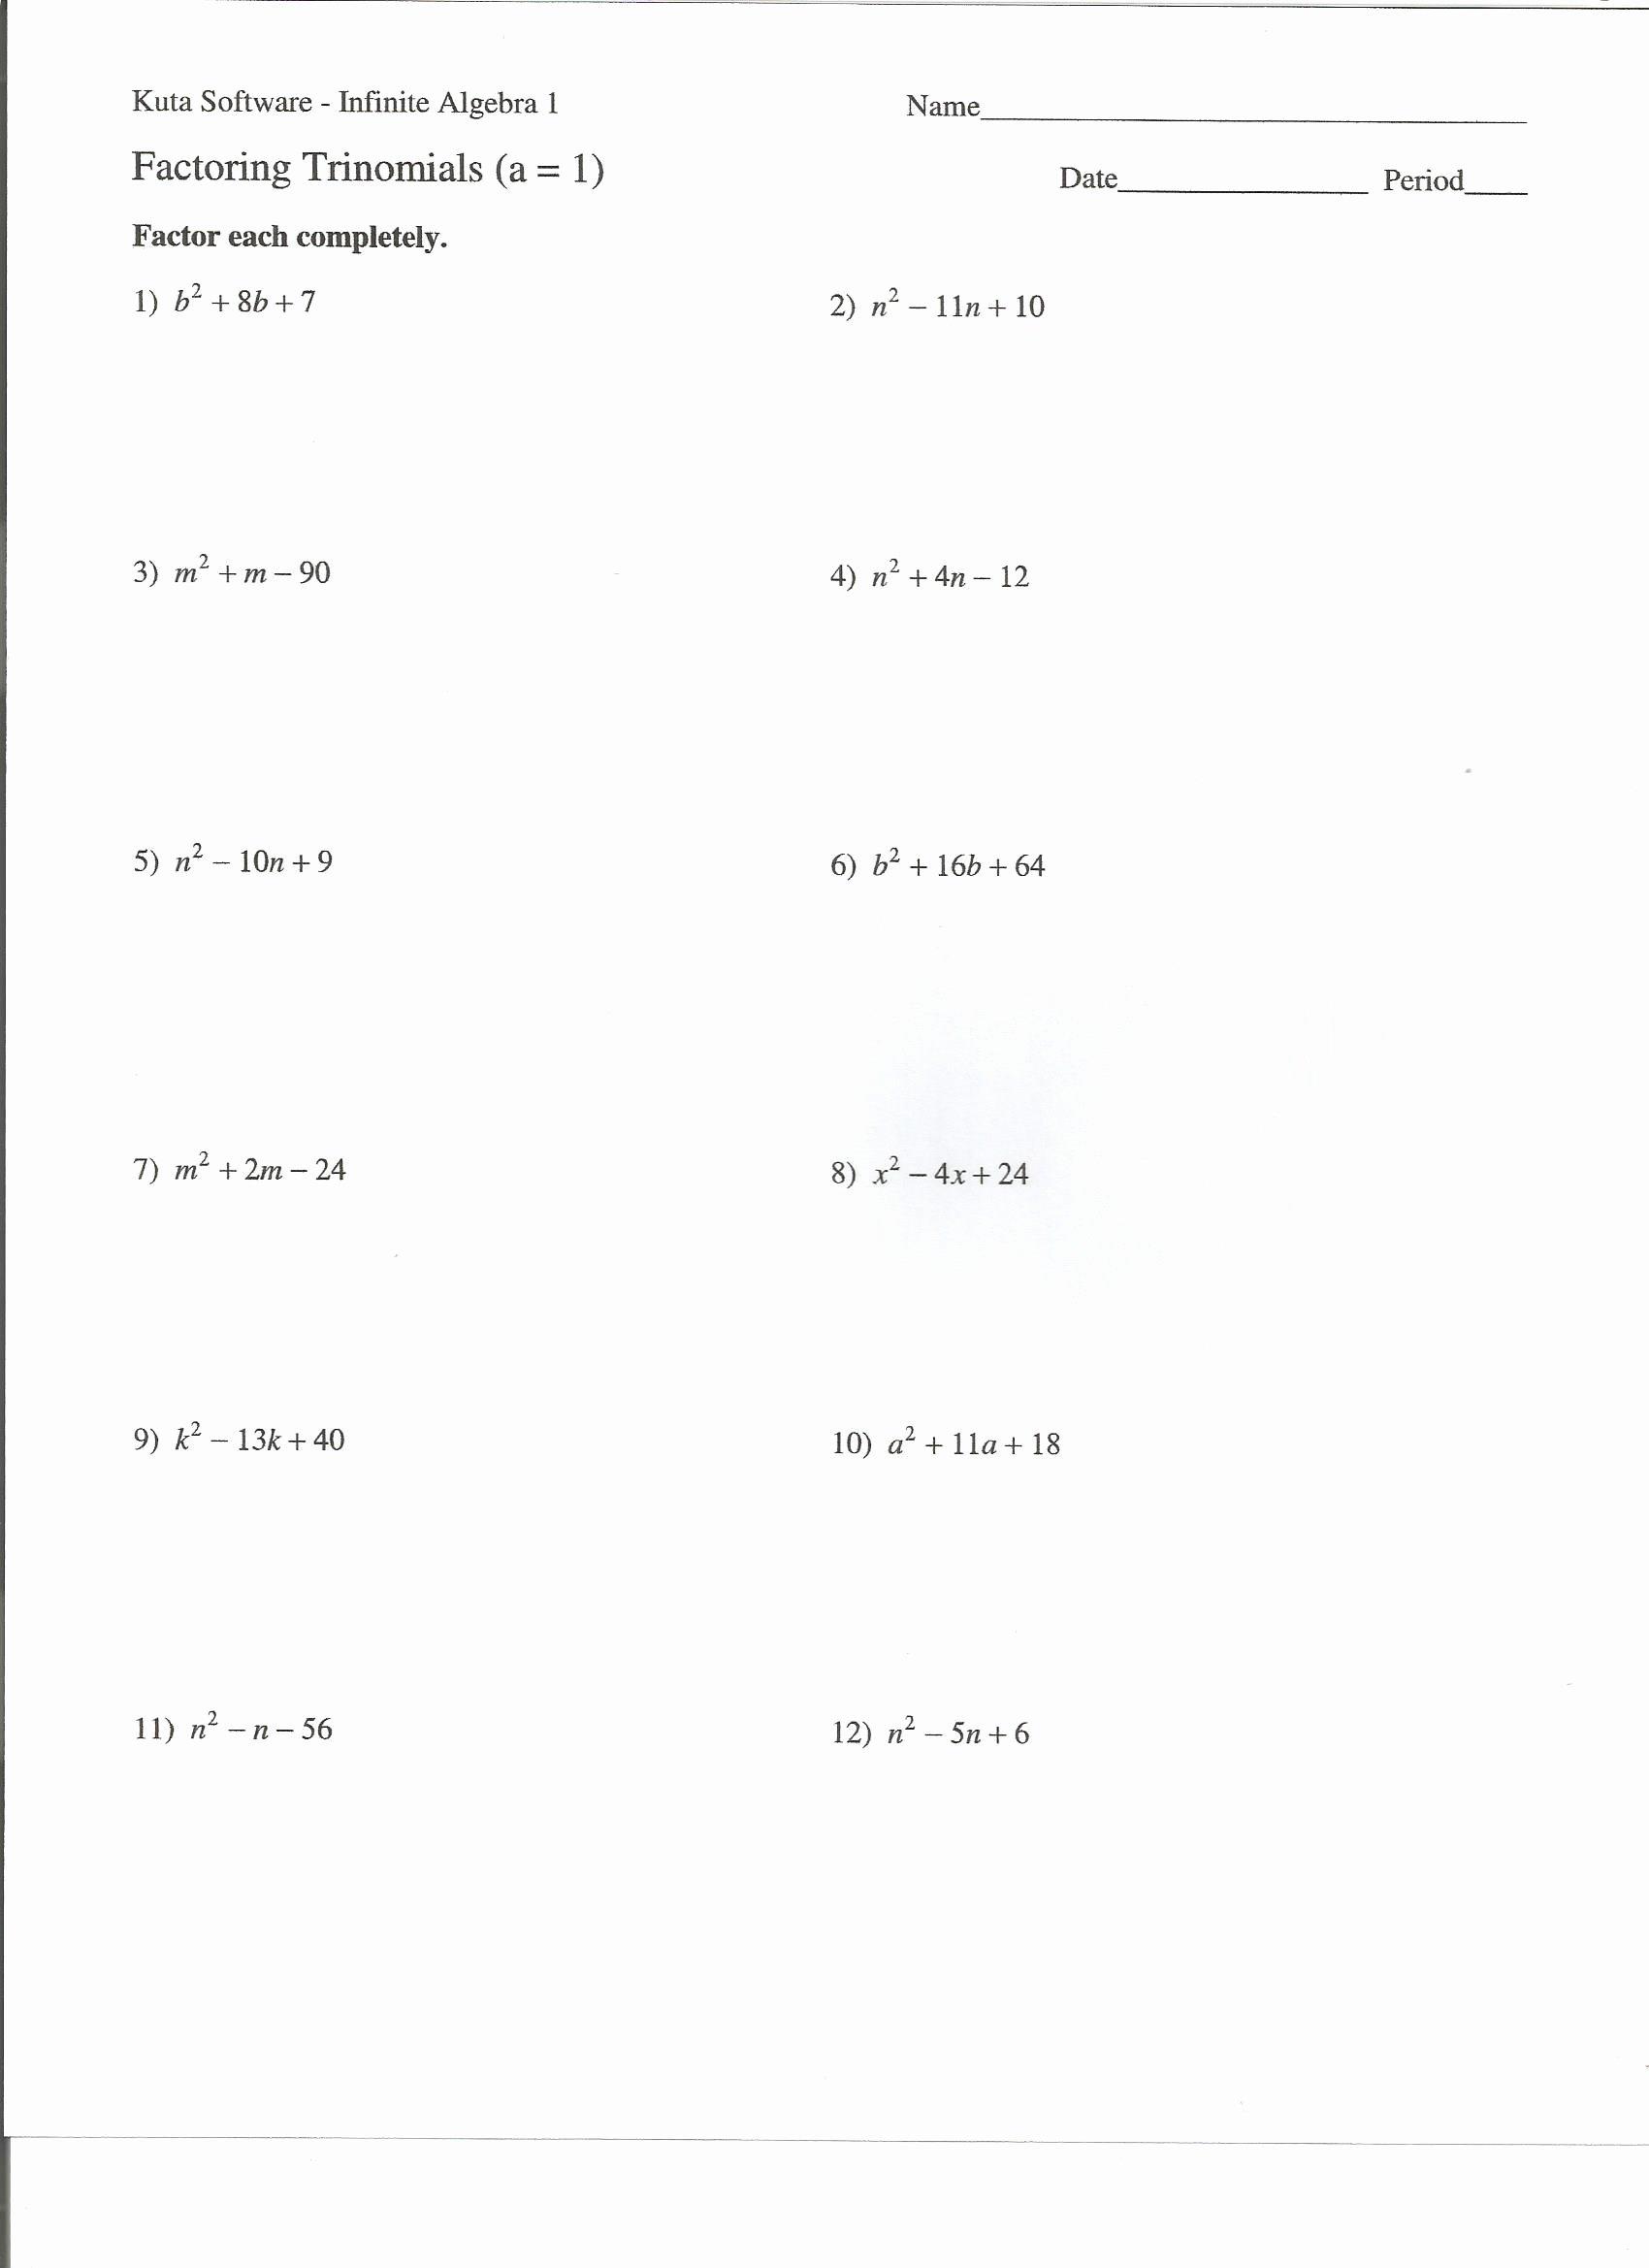 Algebra 2 Factoring Worksheet Inspirational Worksheets Algebra 2 Factoring Worksheet Cheatslist Free